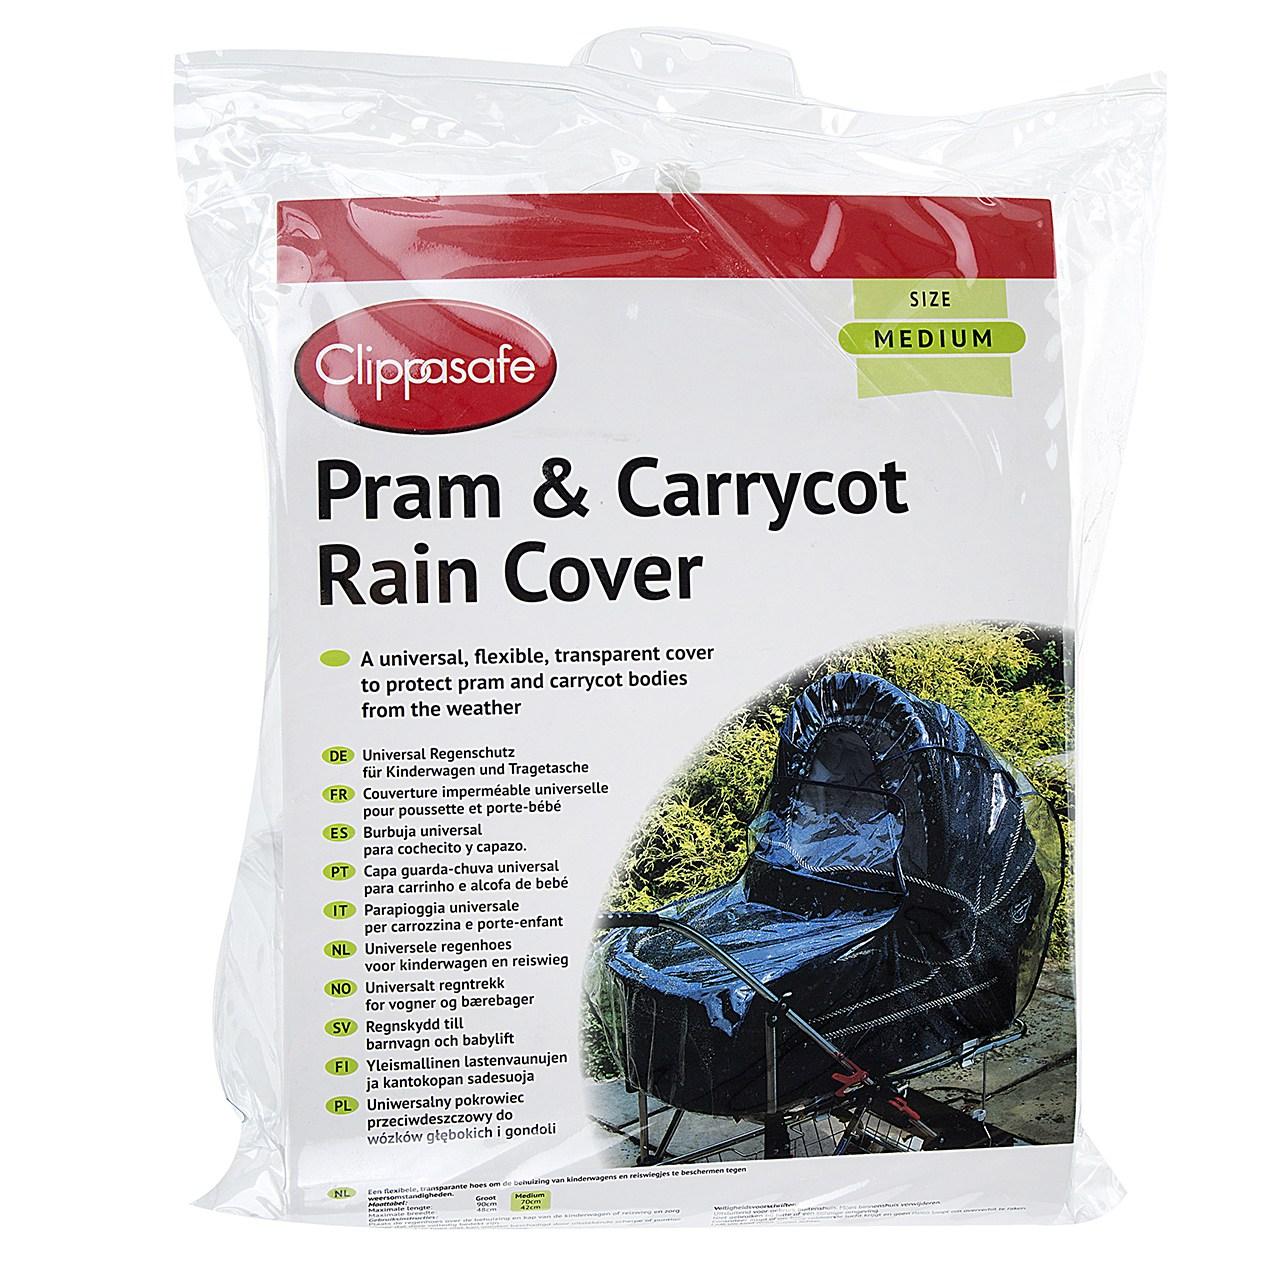 کاور بارانی کلیپاسیف مدل CL241 Universal Pram And Carrycot